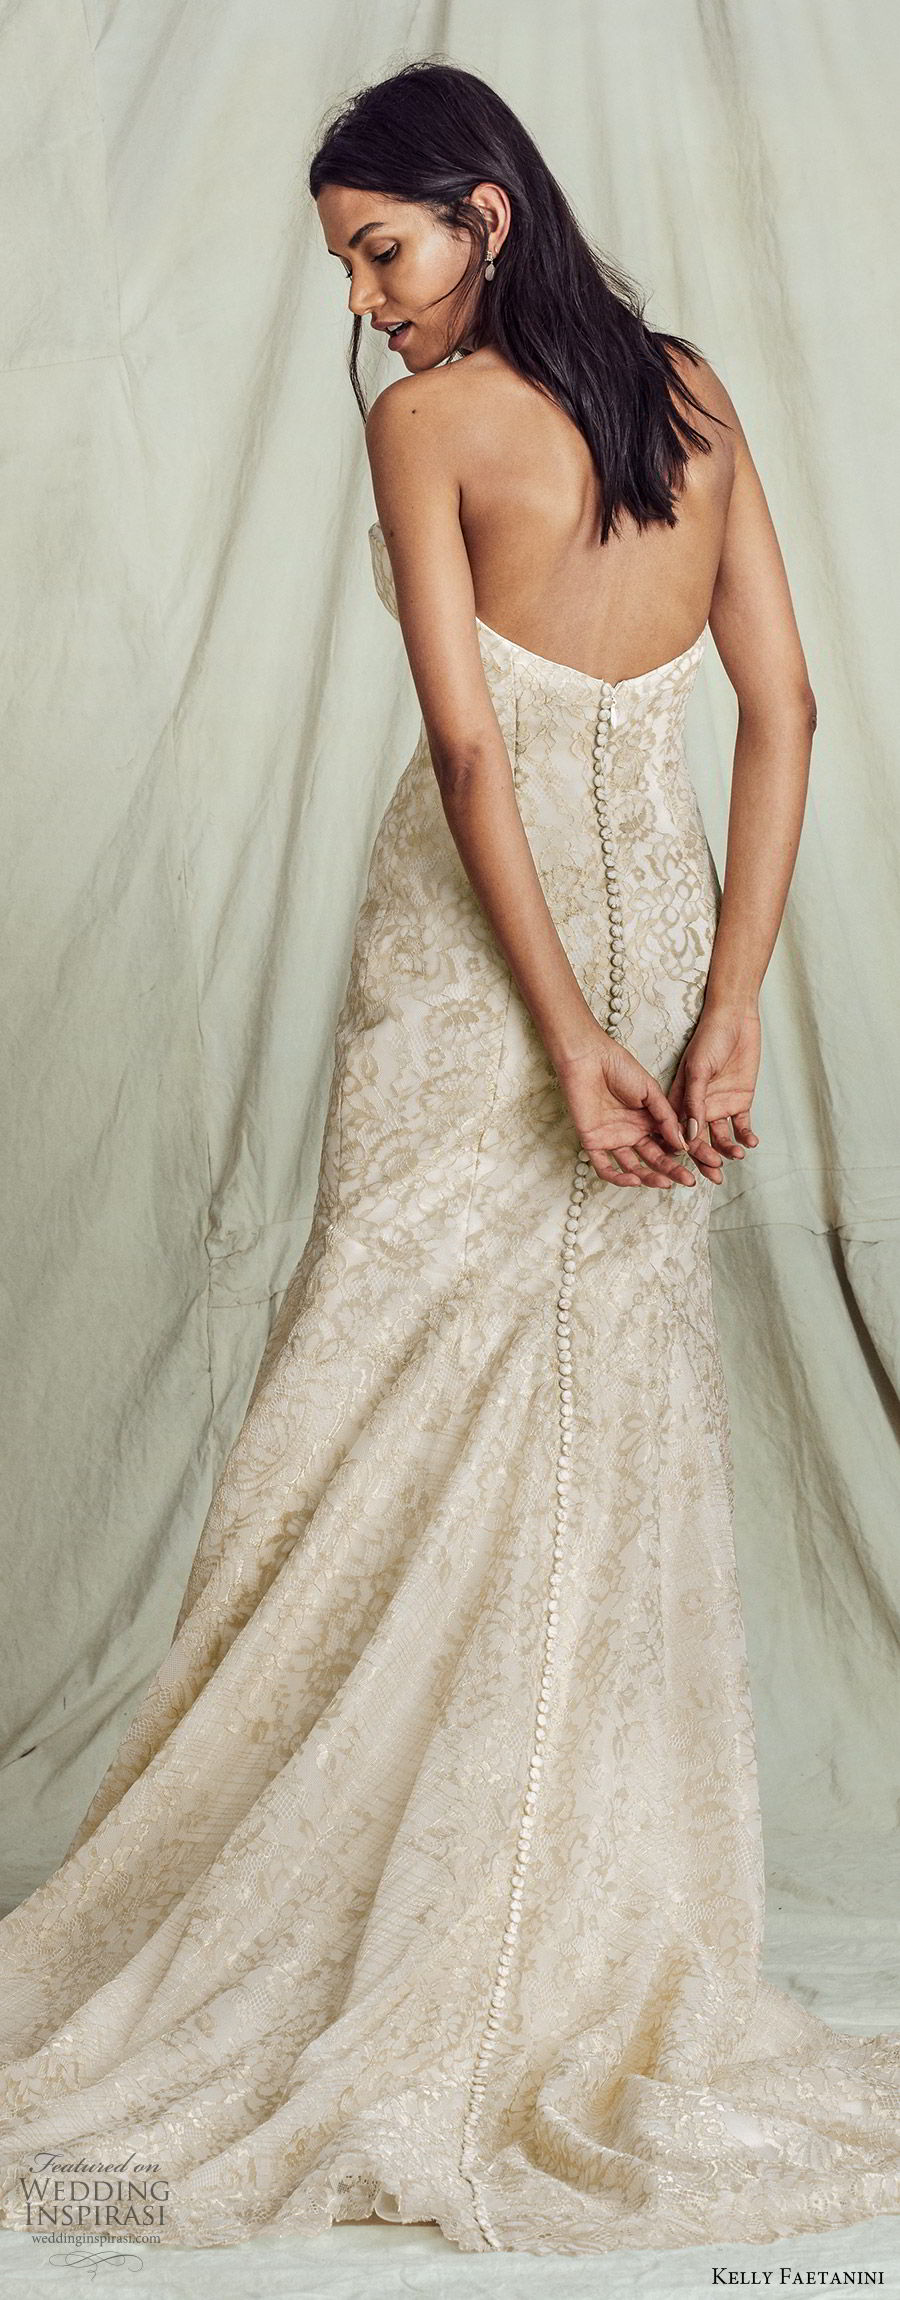 kelly faetanini fall 2019 bridal strapless sweetheart trumpet mermaid lace wedding dress chapel train gold color romantic elegant  (13) bv